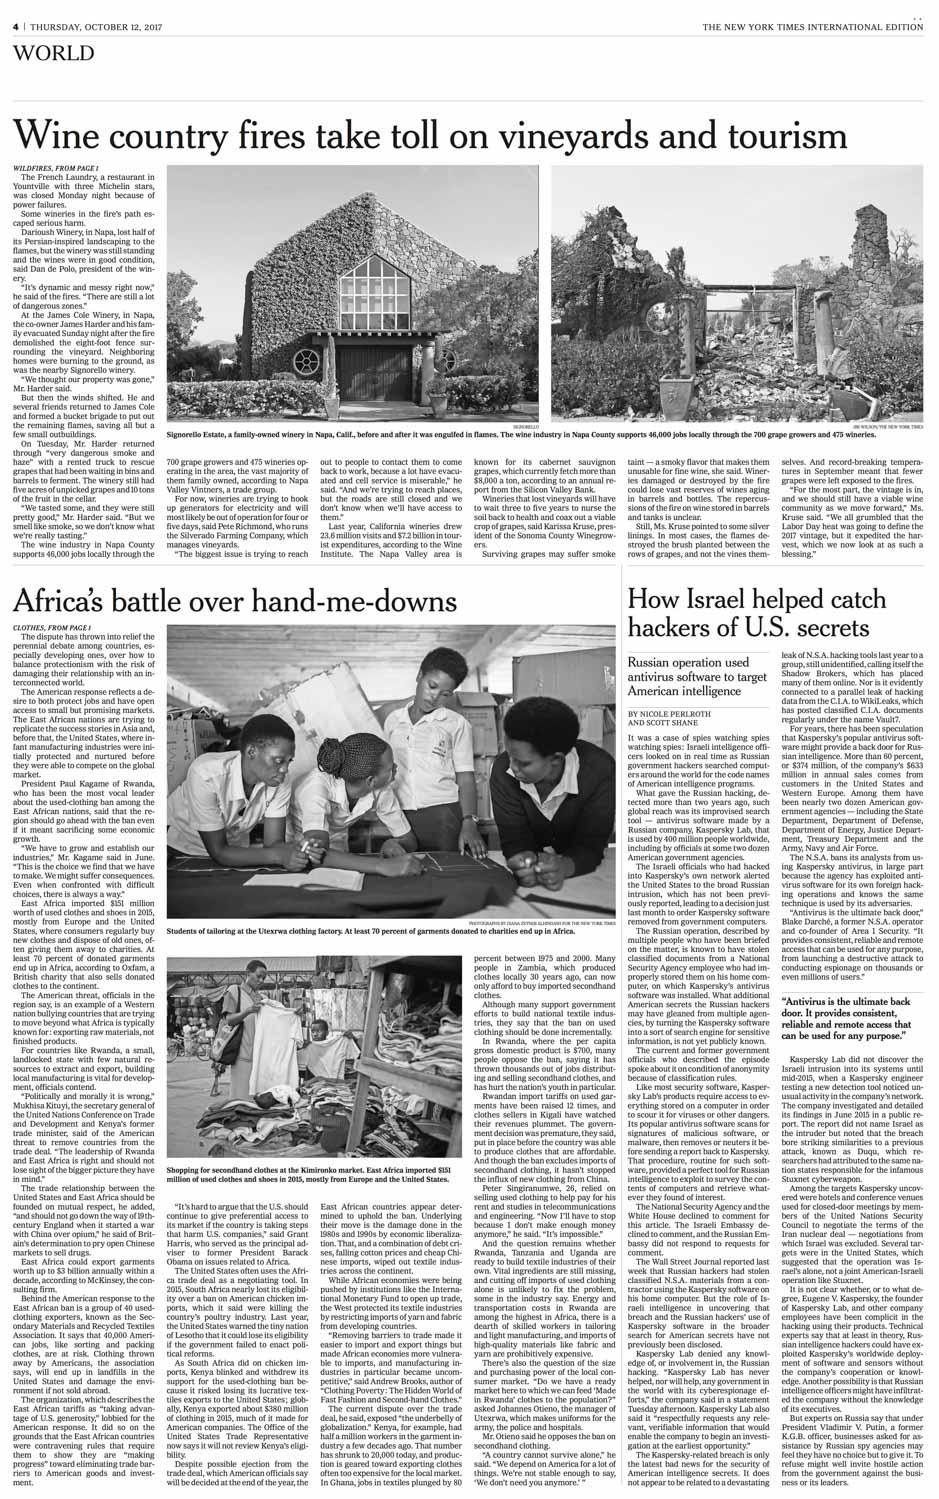 Diana Zeyneb Alhindawi_2017_10_12_International New York Times_page A4_rwanda africa clothing manufacturing agoa.jpg